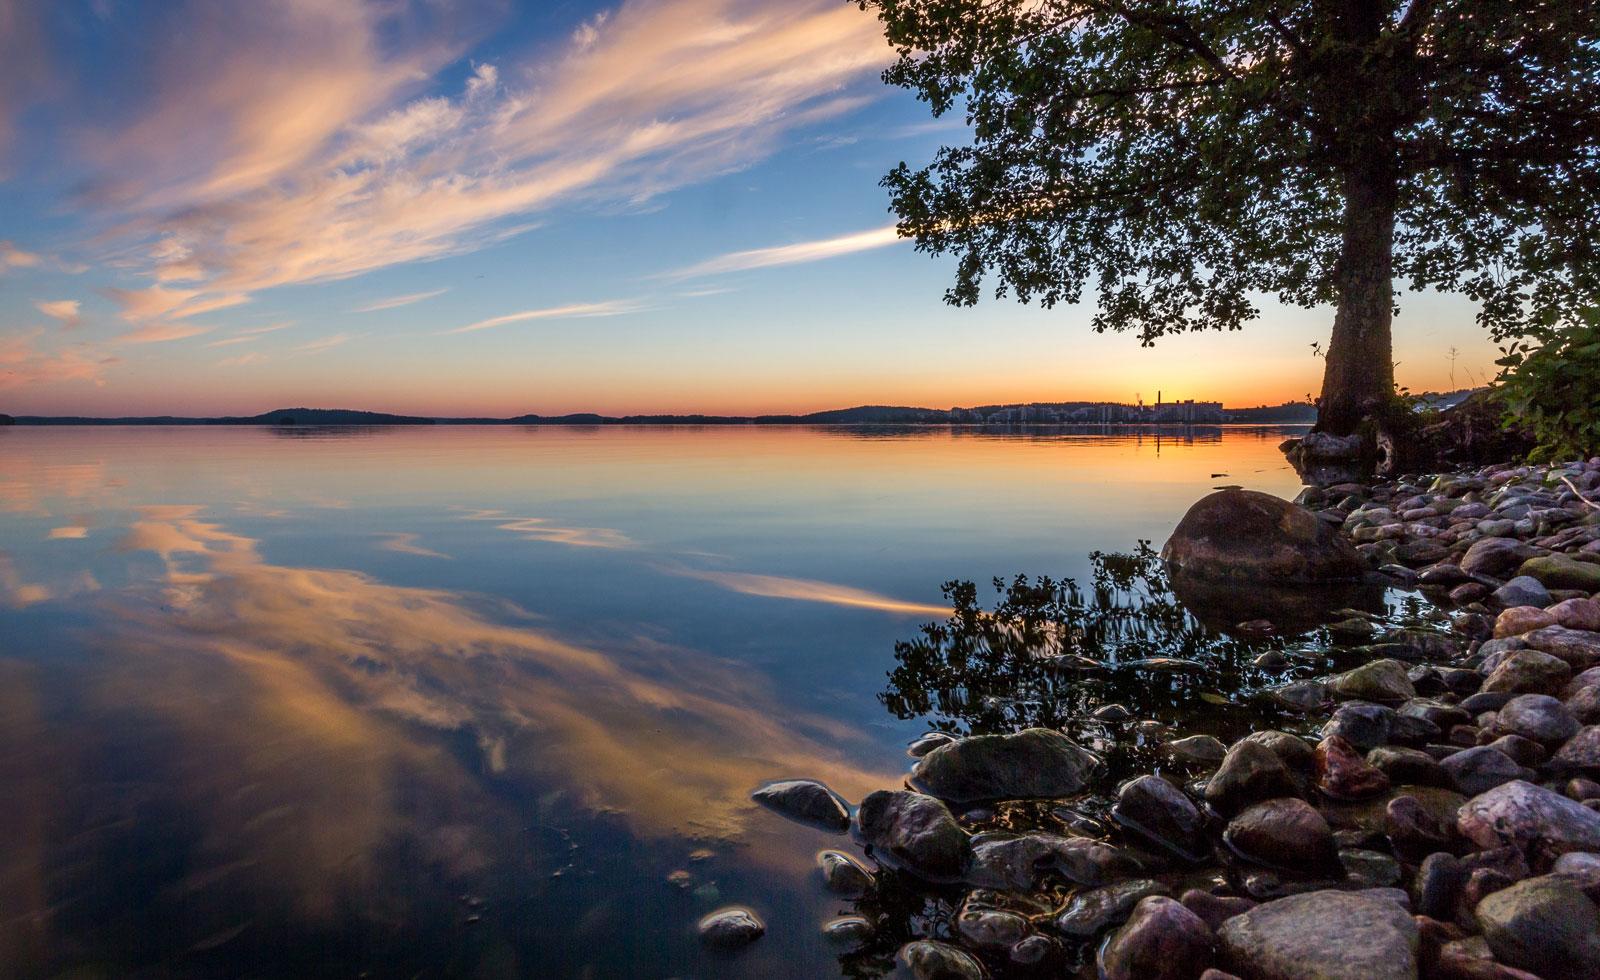 ironman 703 finland lake 1600x980.jpg